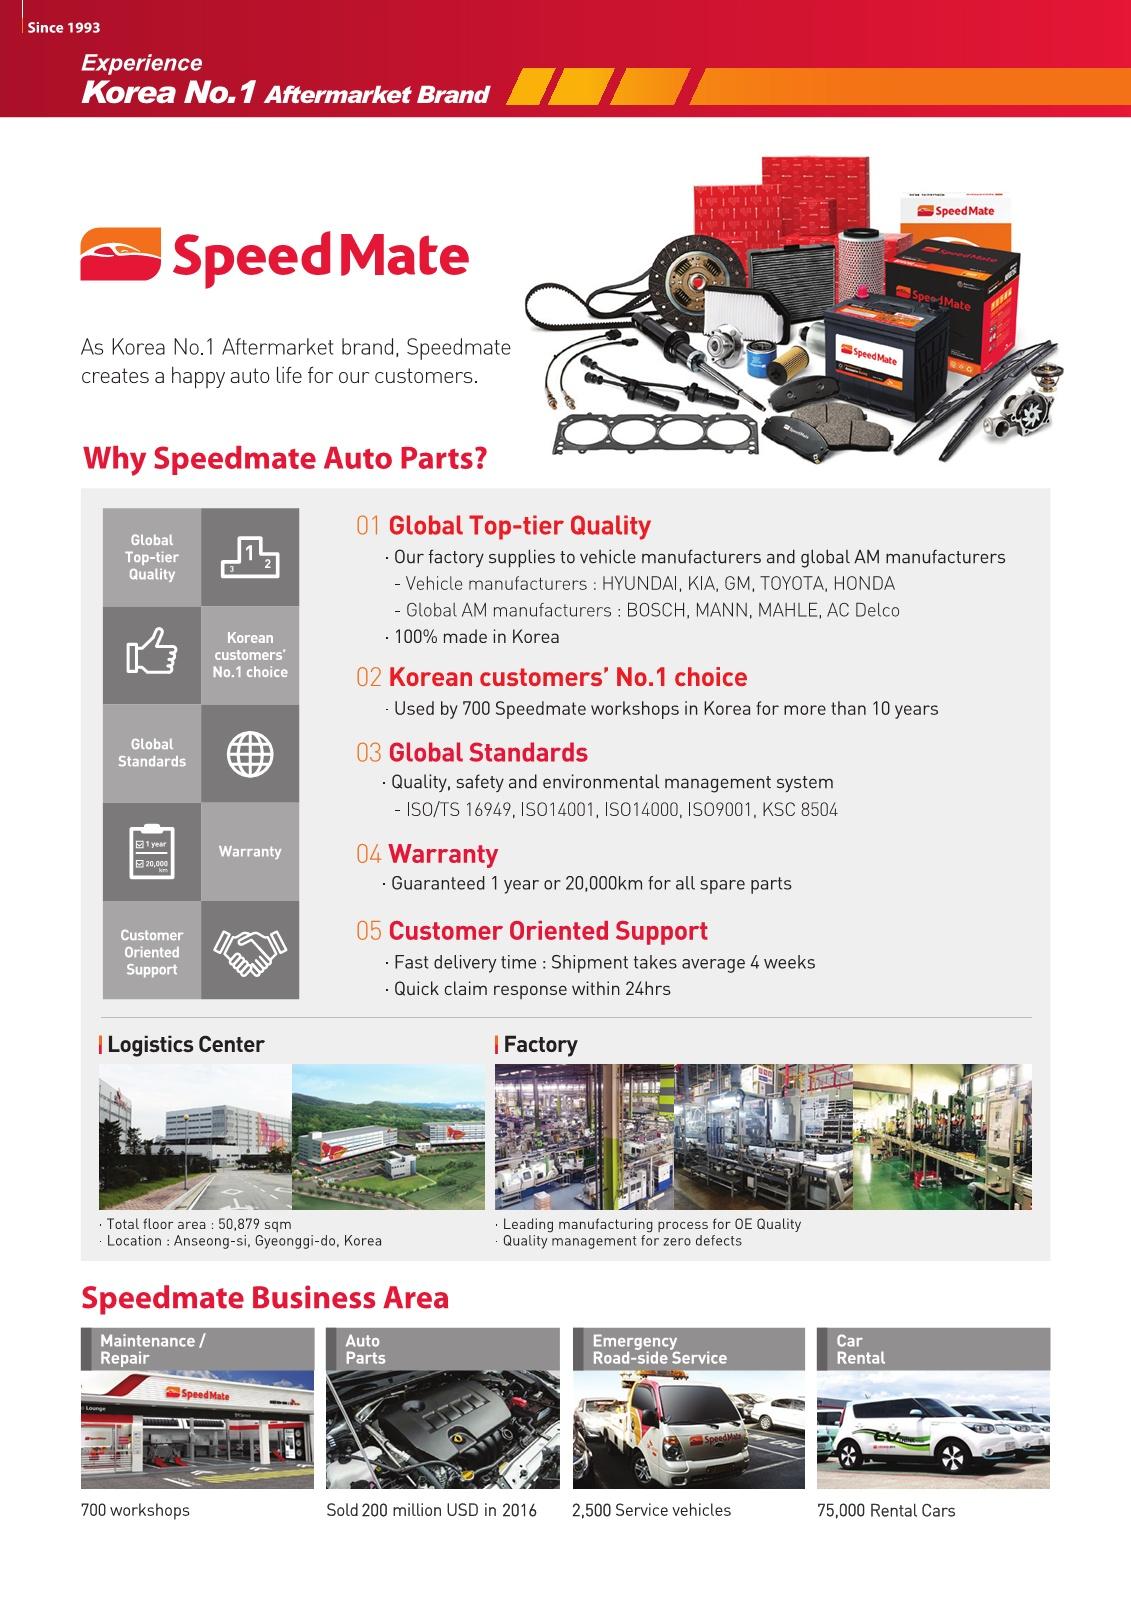 SPEEDMATE-2.jpg